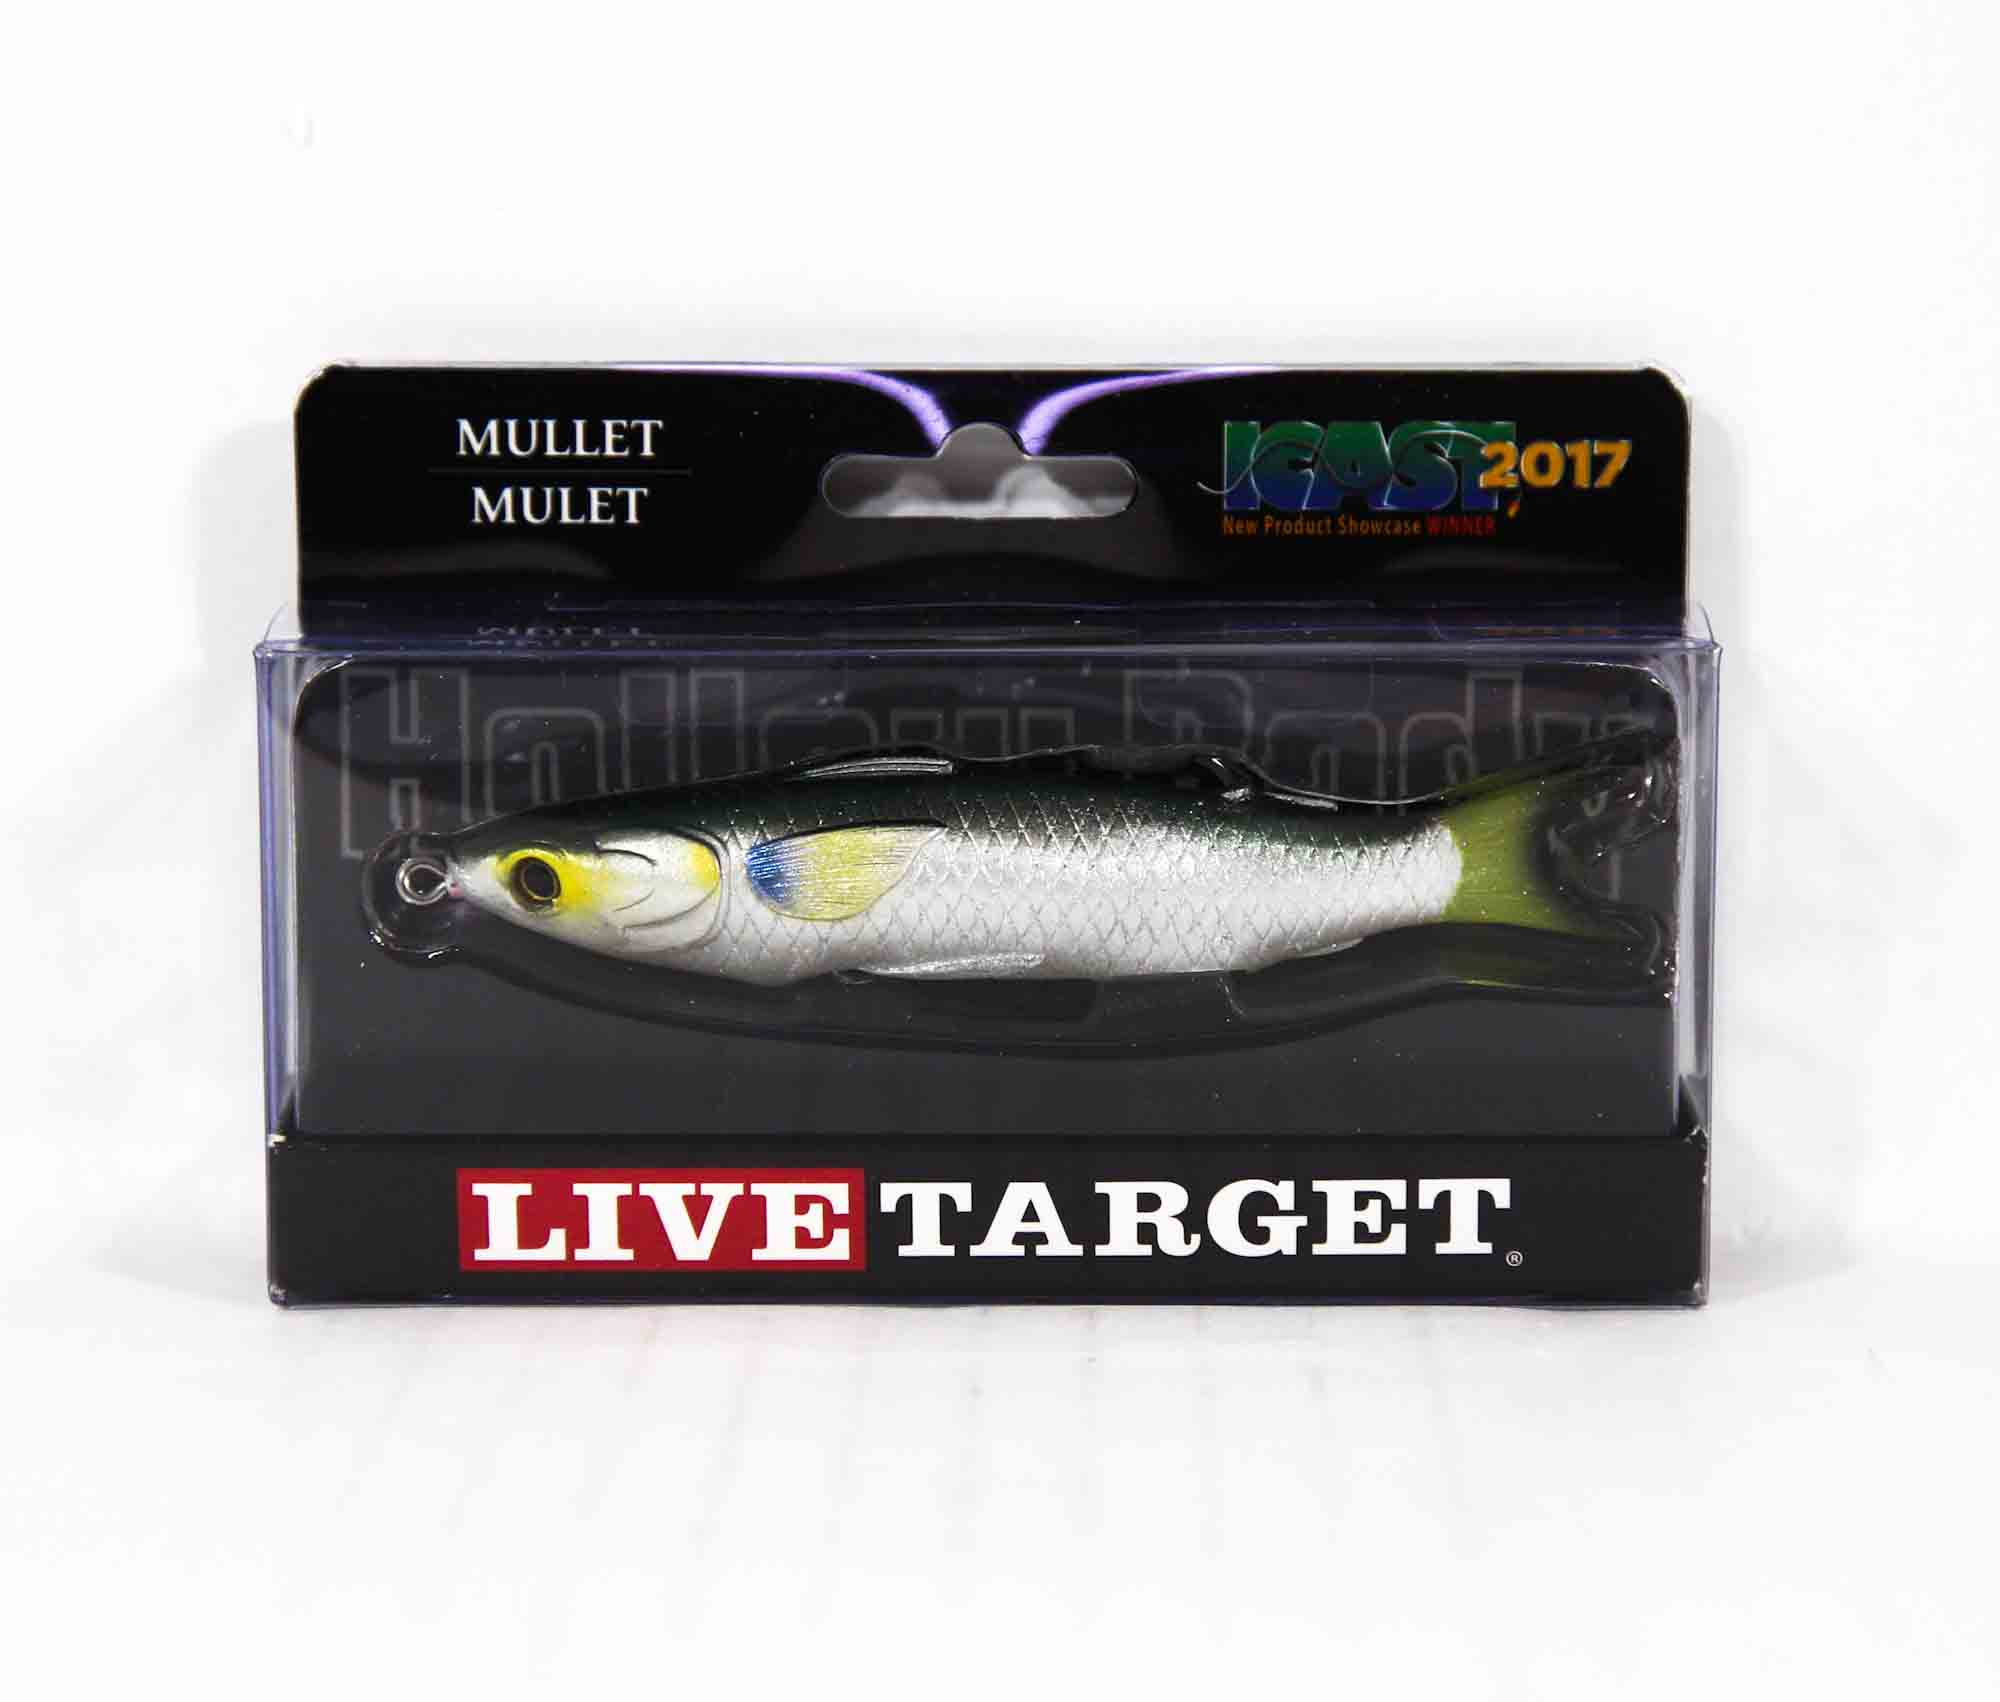 Live Target MUH95T716 Mullet Walking Bait 3.75 Inch Silver (0422)